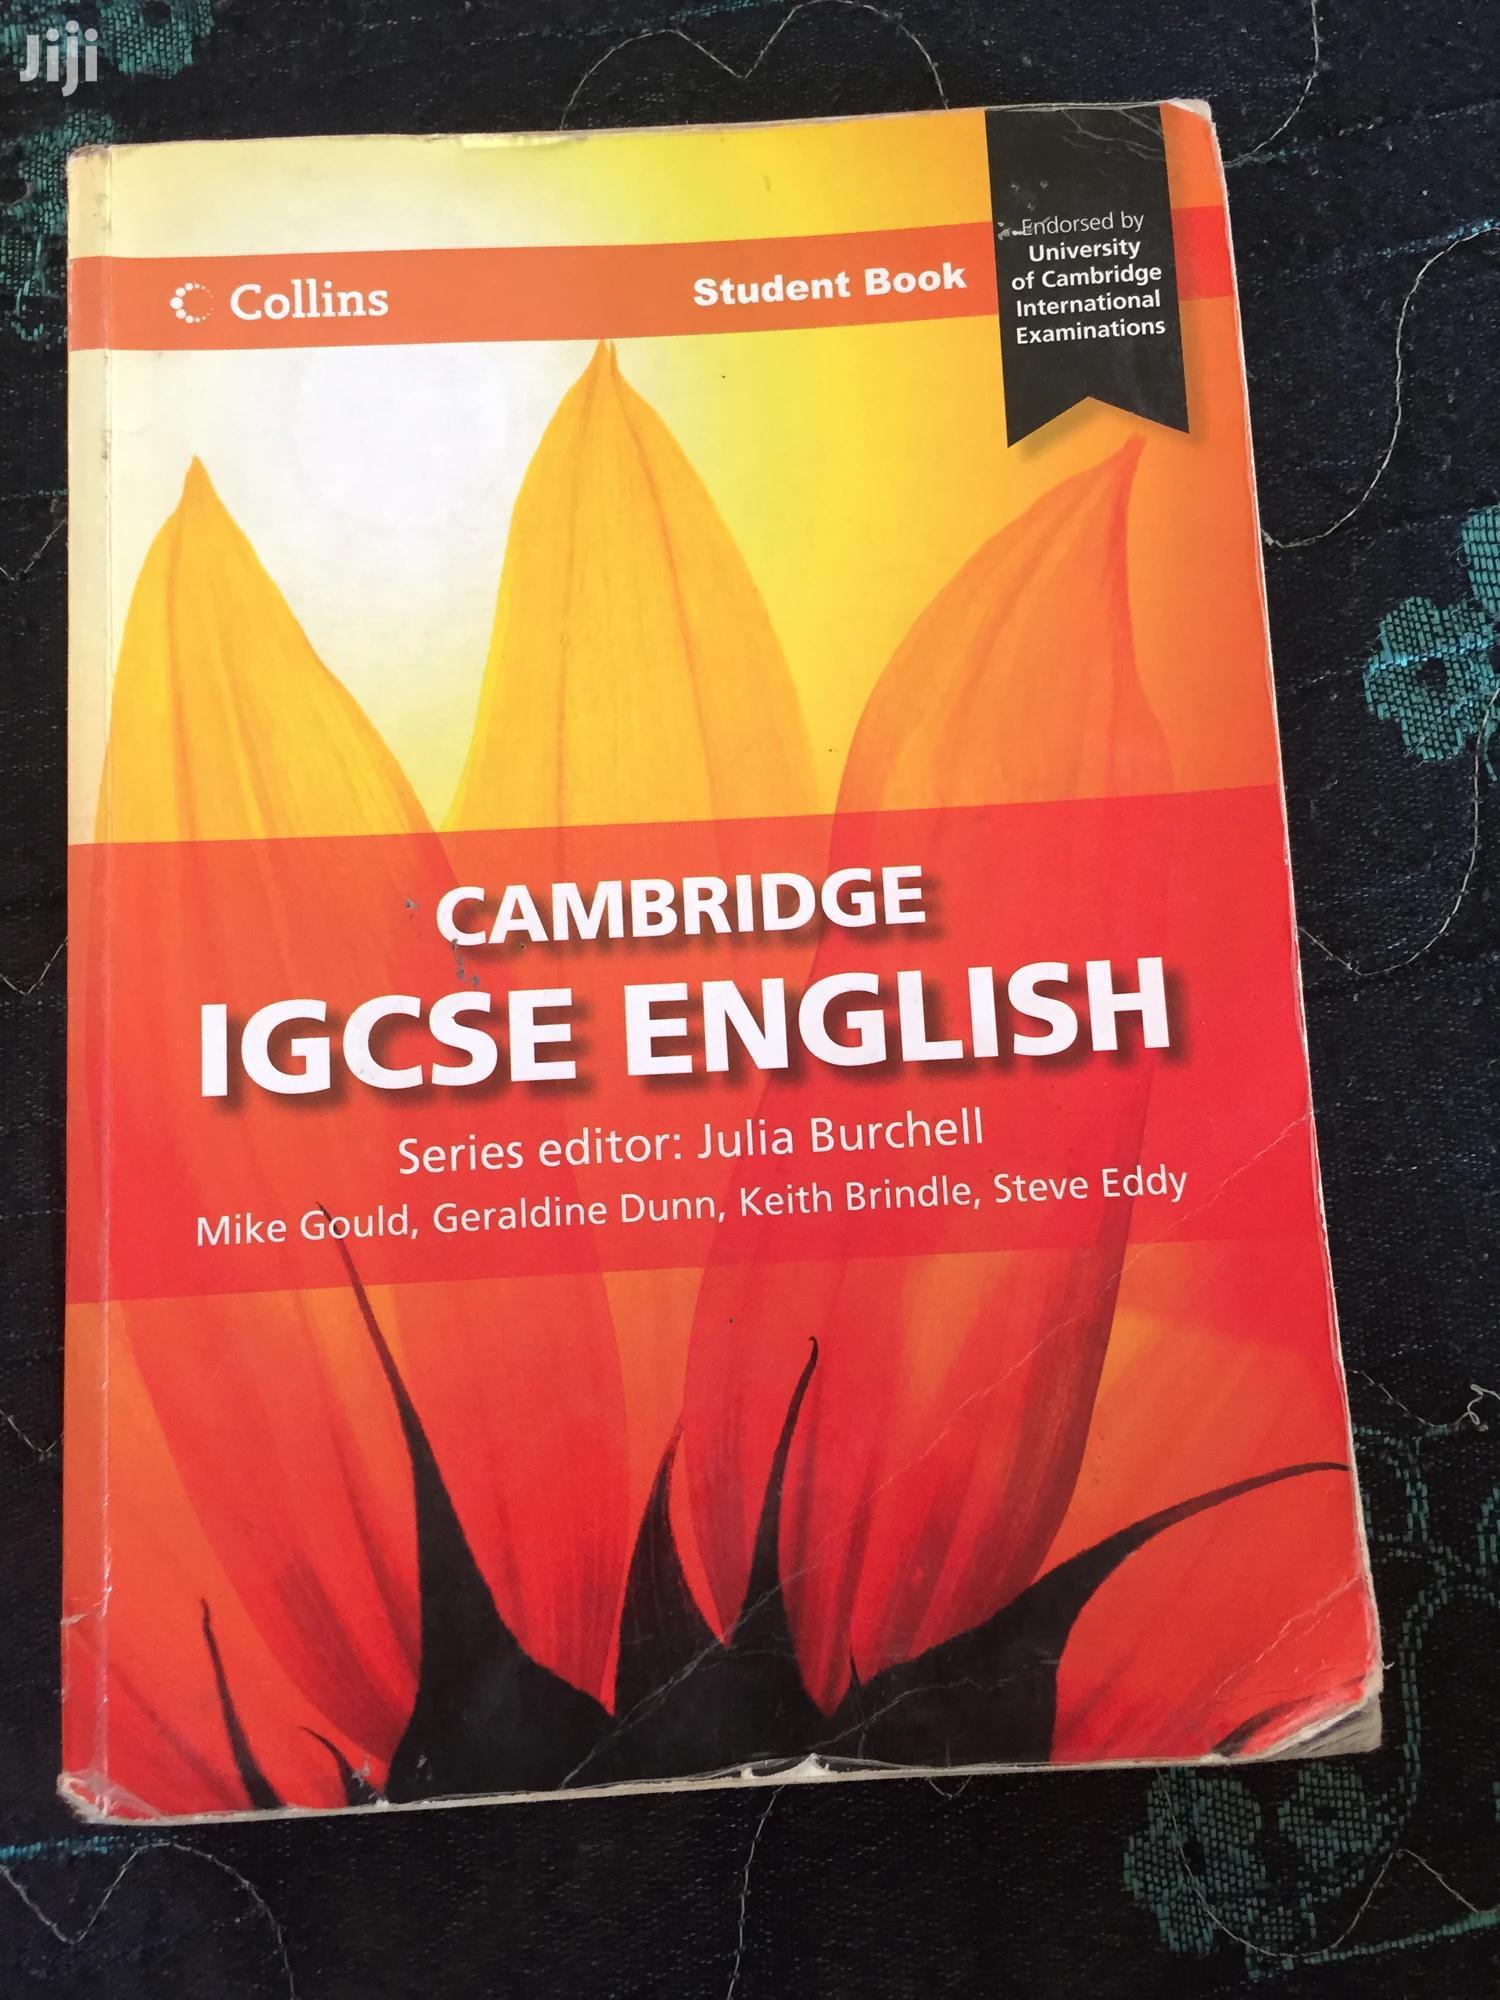 Archive: IGCSE English Textbook